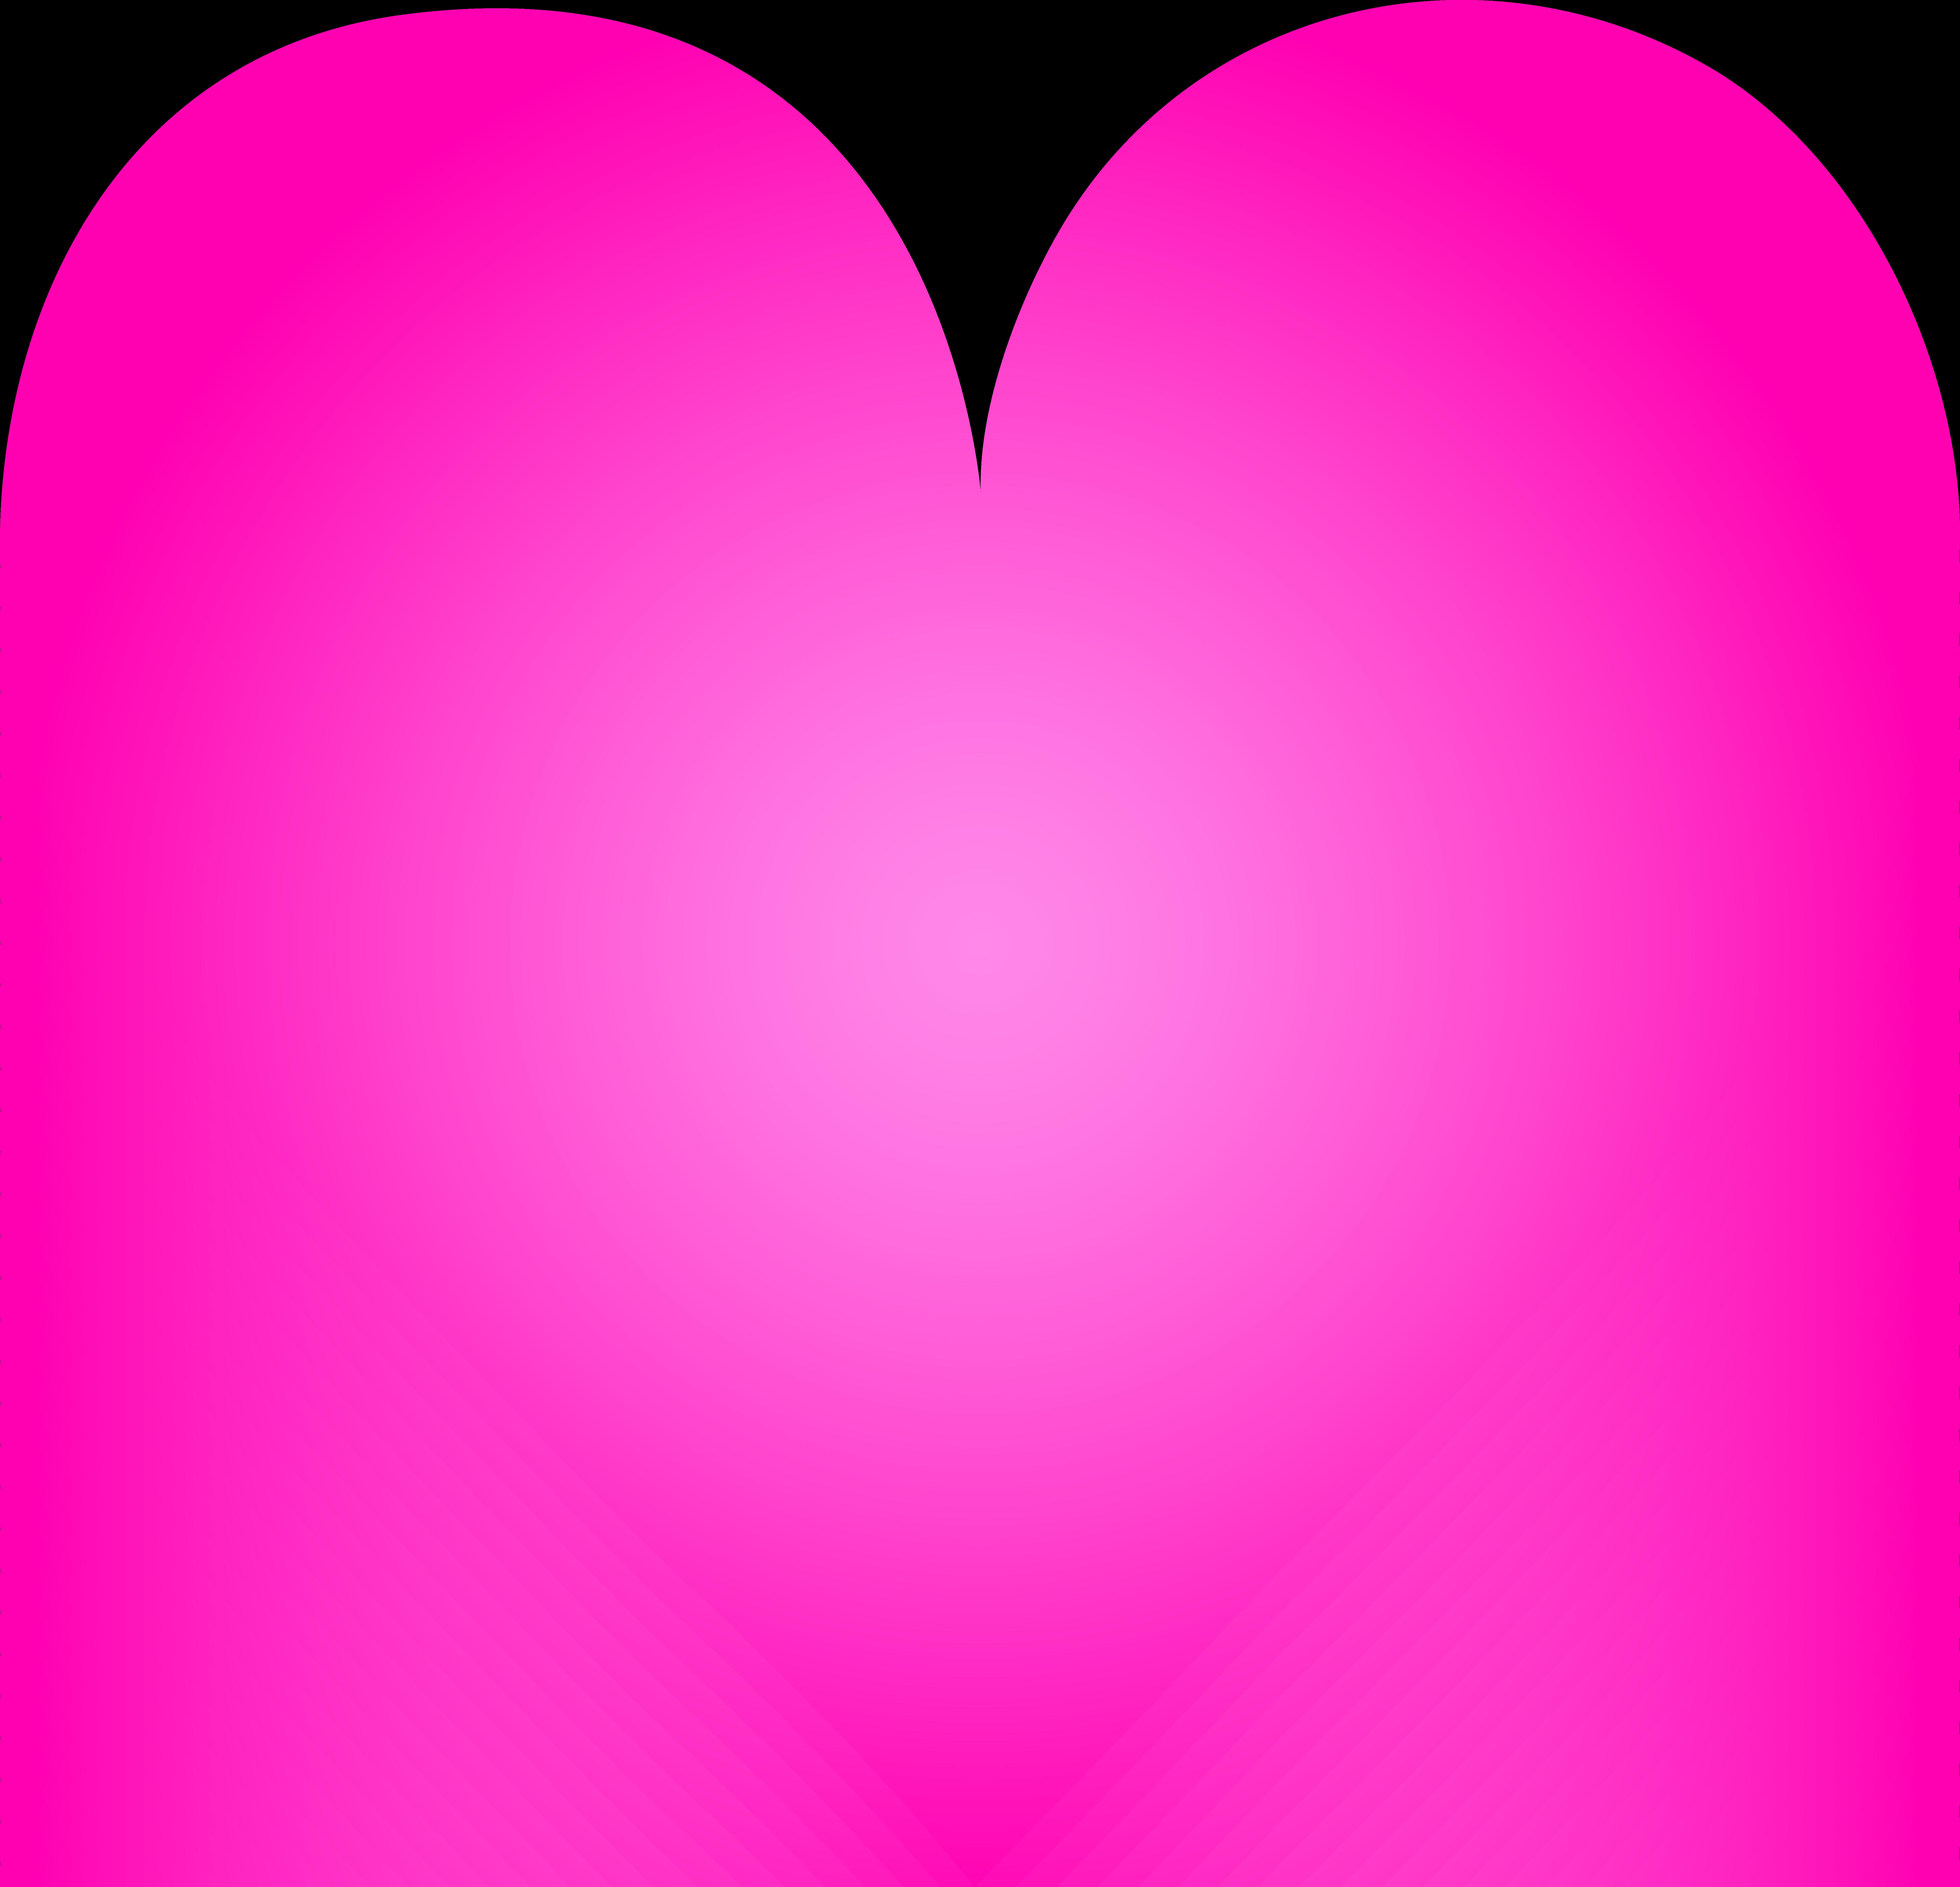 Big Pink Heart.